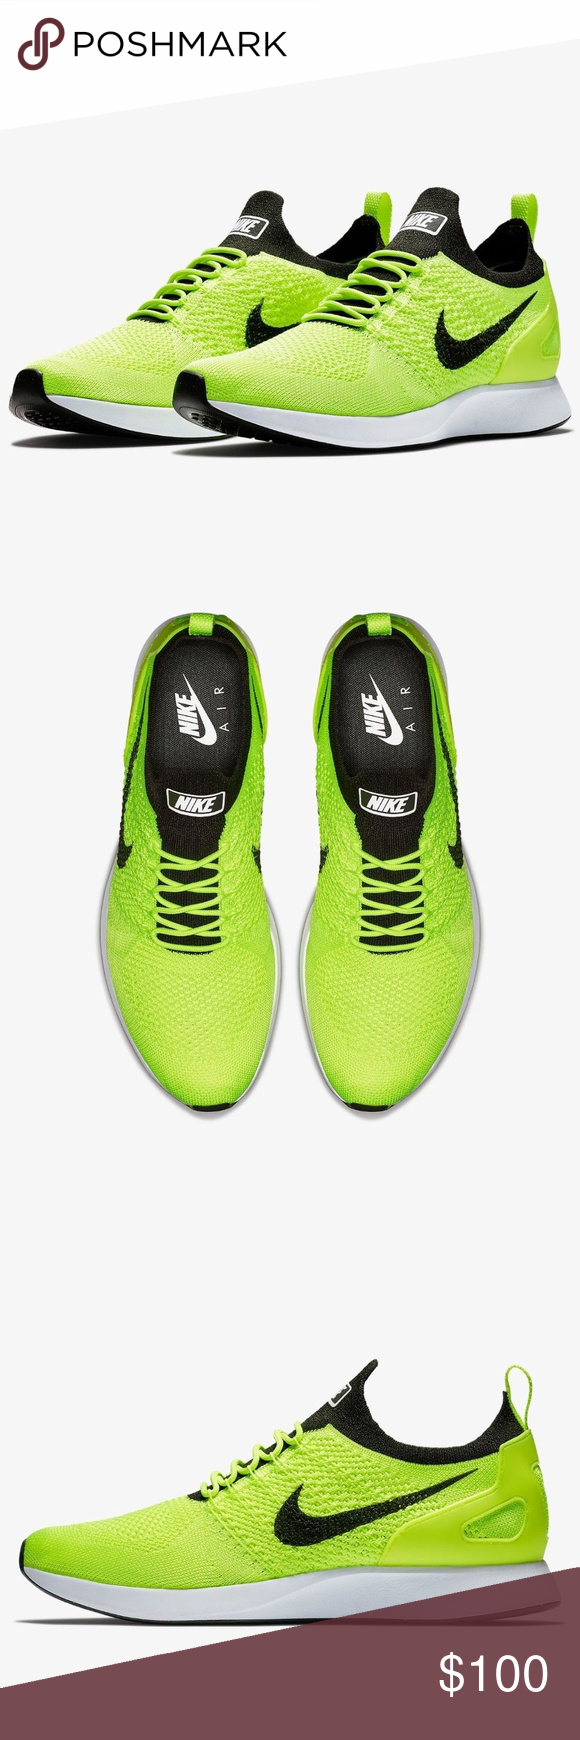 91a974ebbda8 Nike Air Zoom Mariah Flyknit Racer Running Shoes Nike Air Zoom Mariah  Flyknit Racer Volt